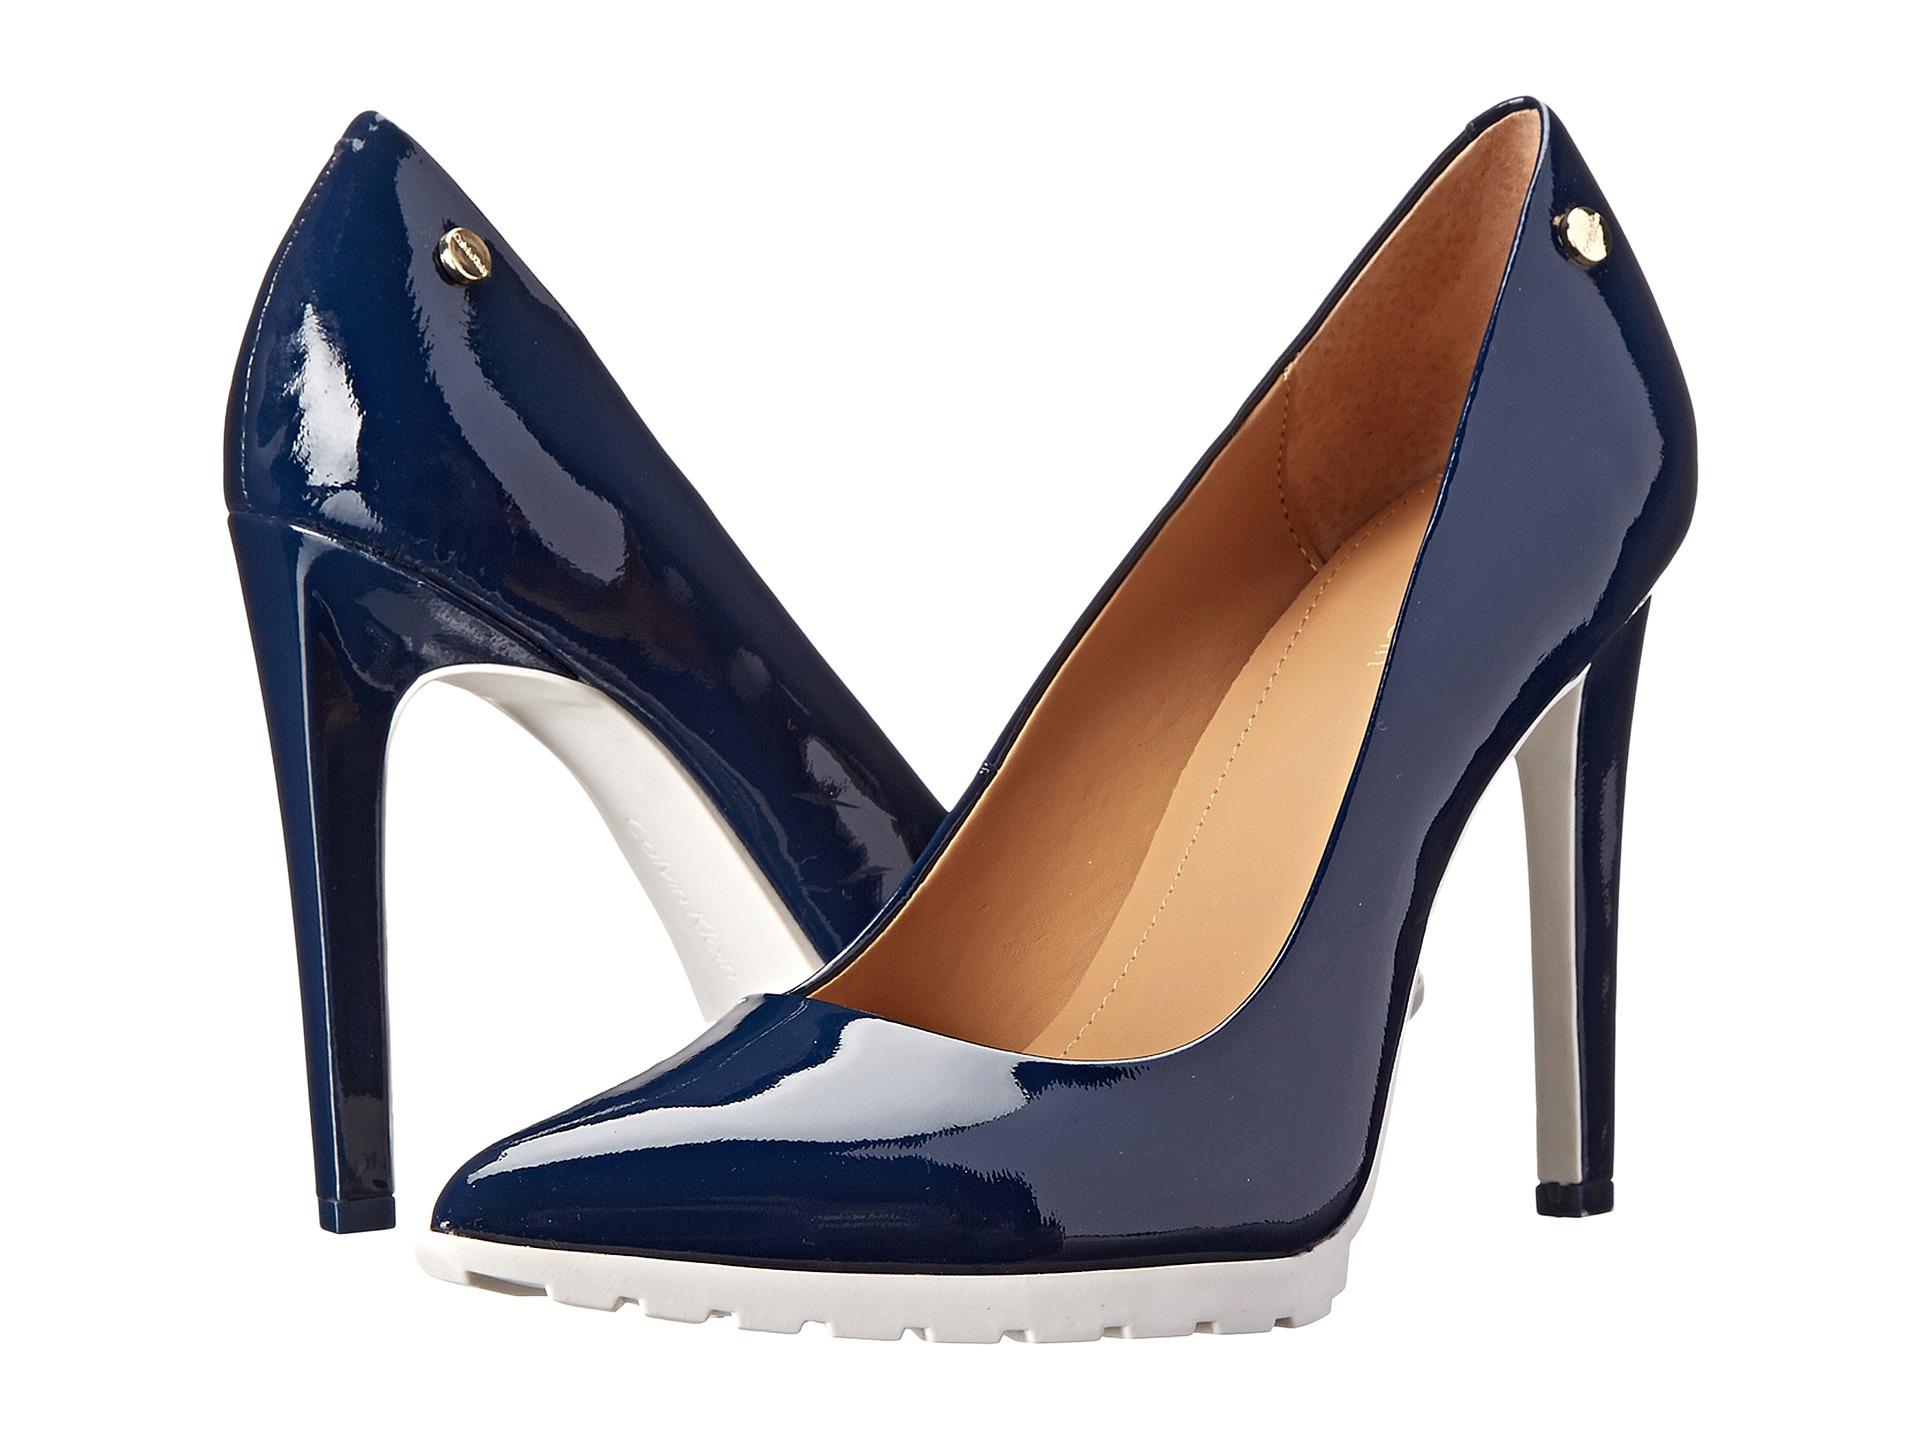 Cheap Sale Purchase Free Shipping Cheapest FOOTWEAR - Courts Calvin Klein Sale Shop Offer Cheap Discount Sale neJhHcvug